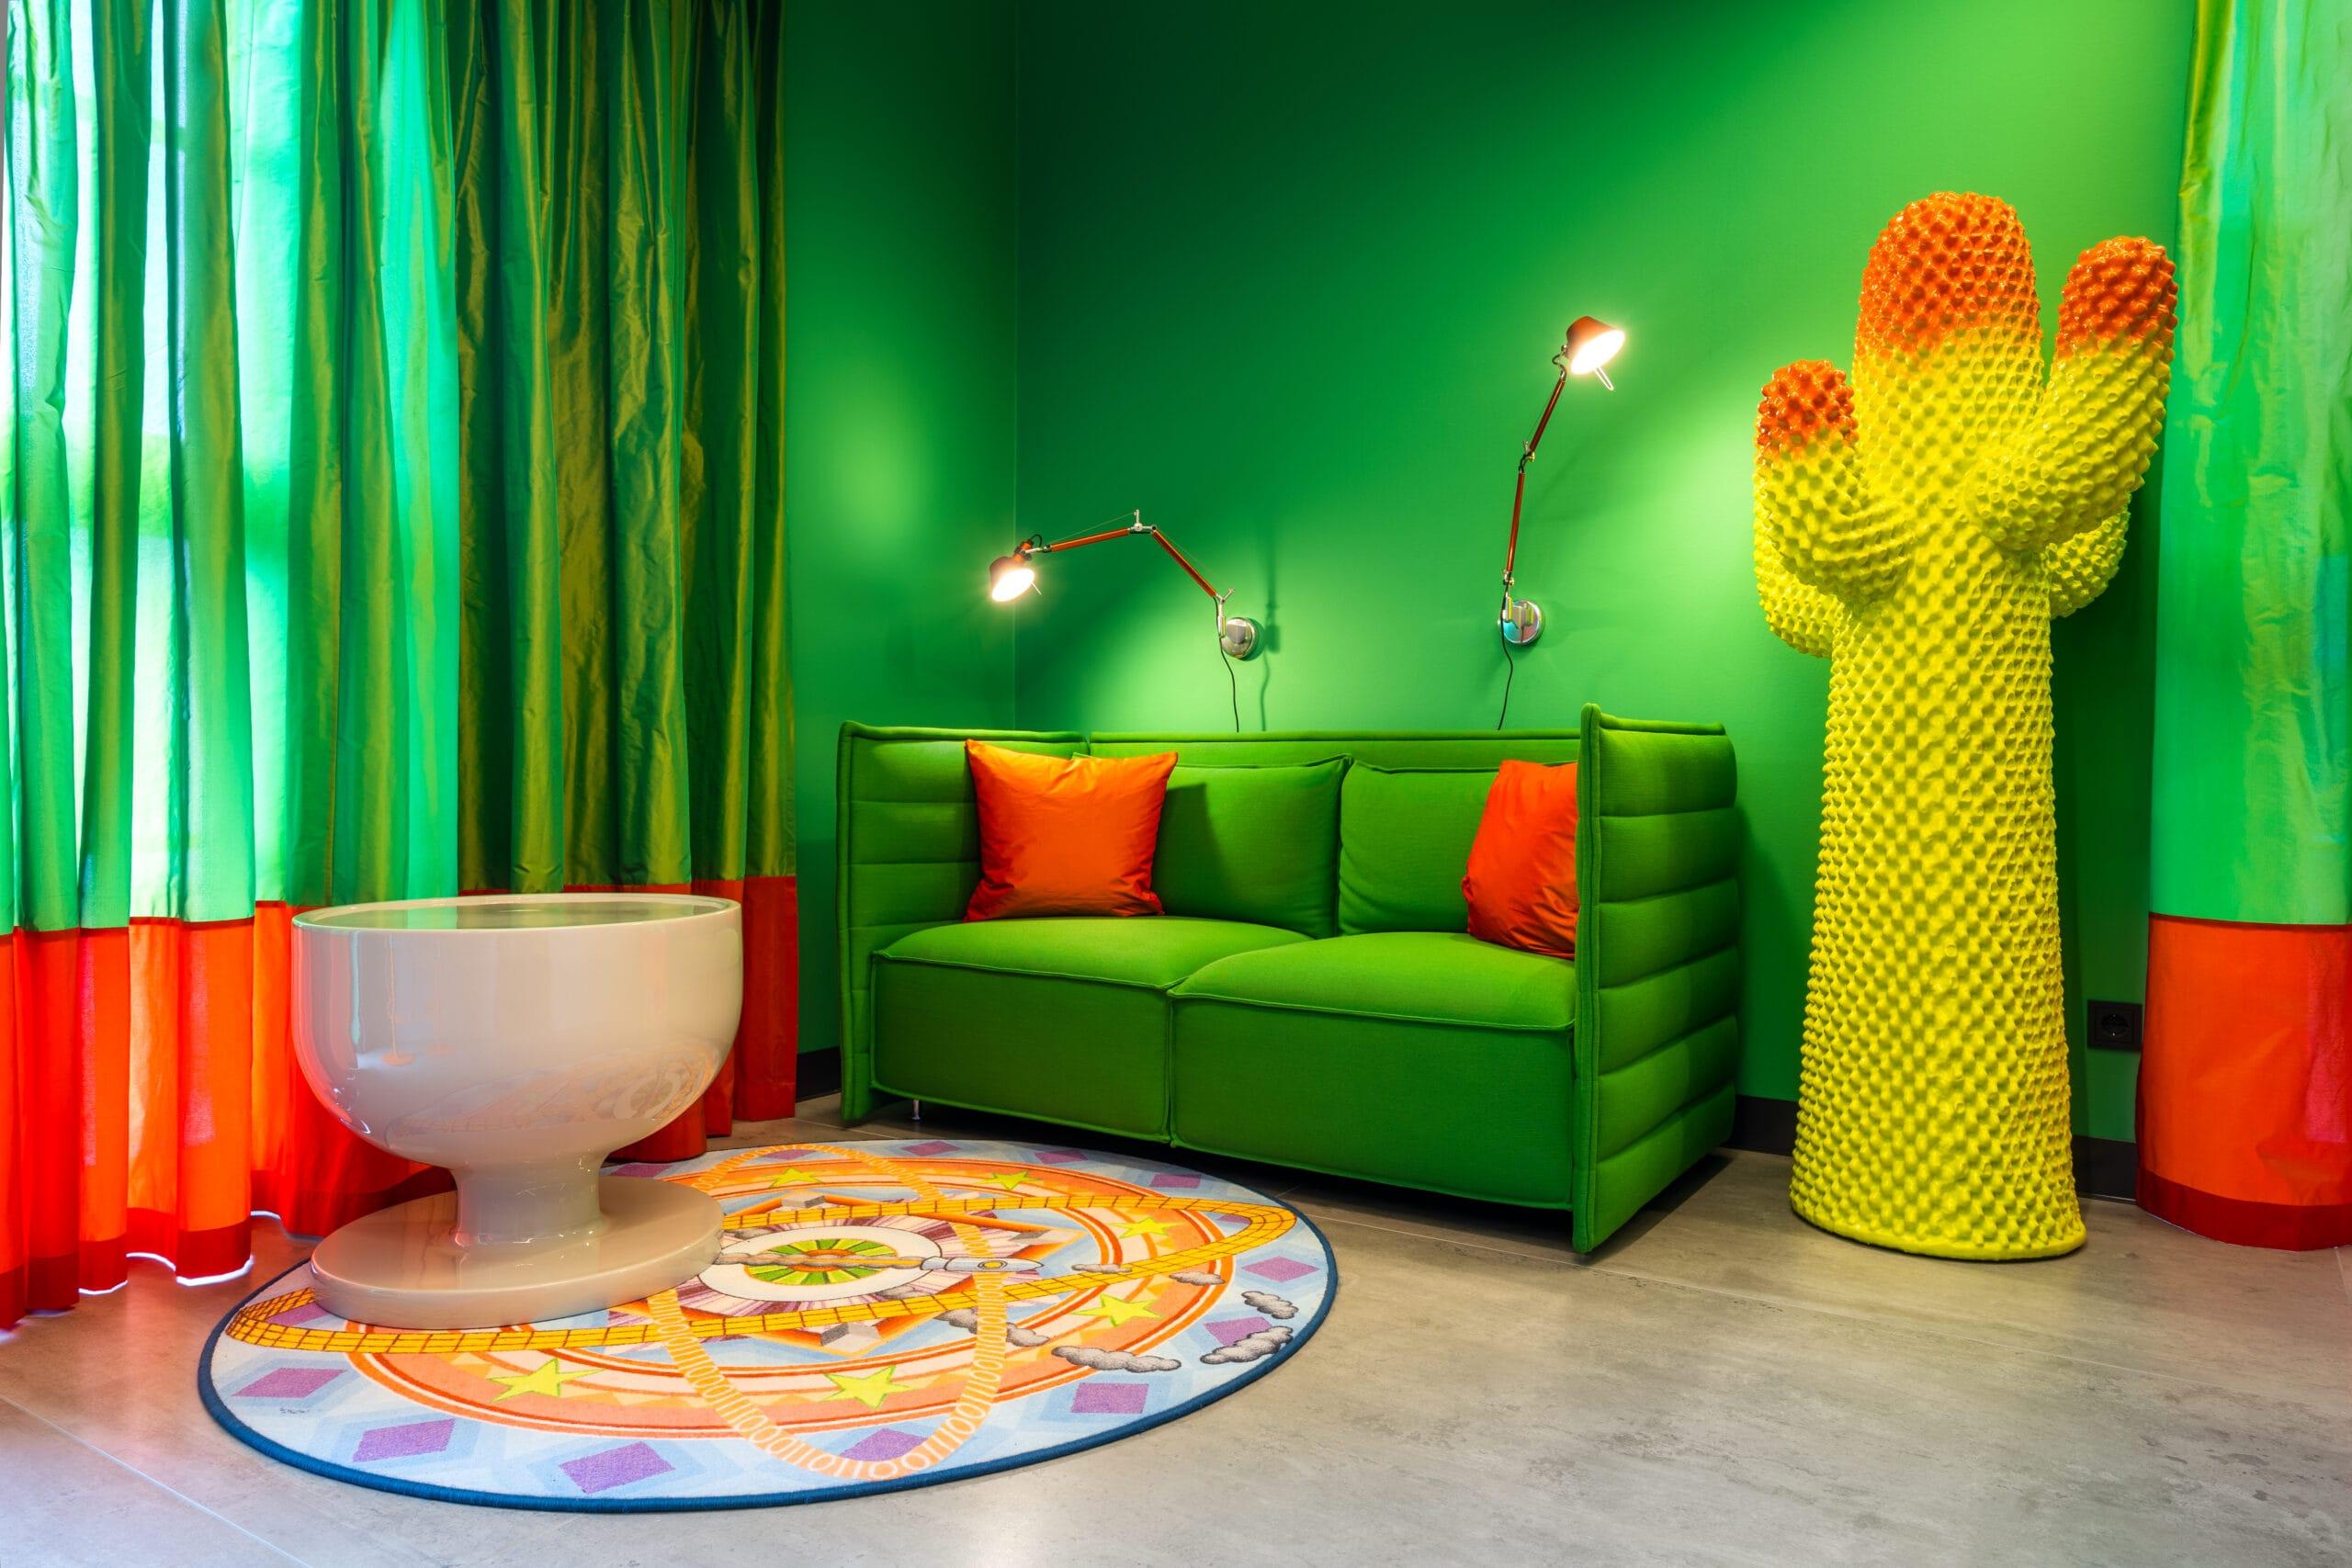 Laurichhof Designhotel: Bewohnbare Showrooms mit Charakter